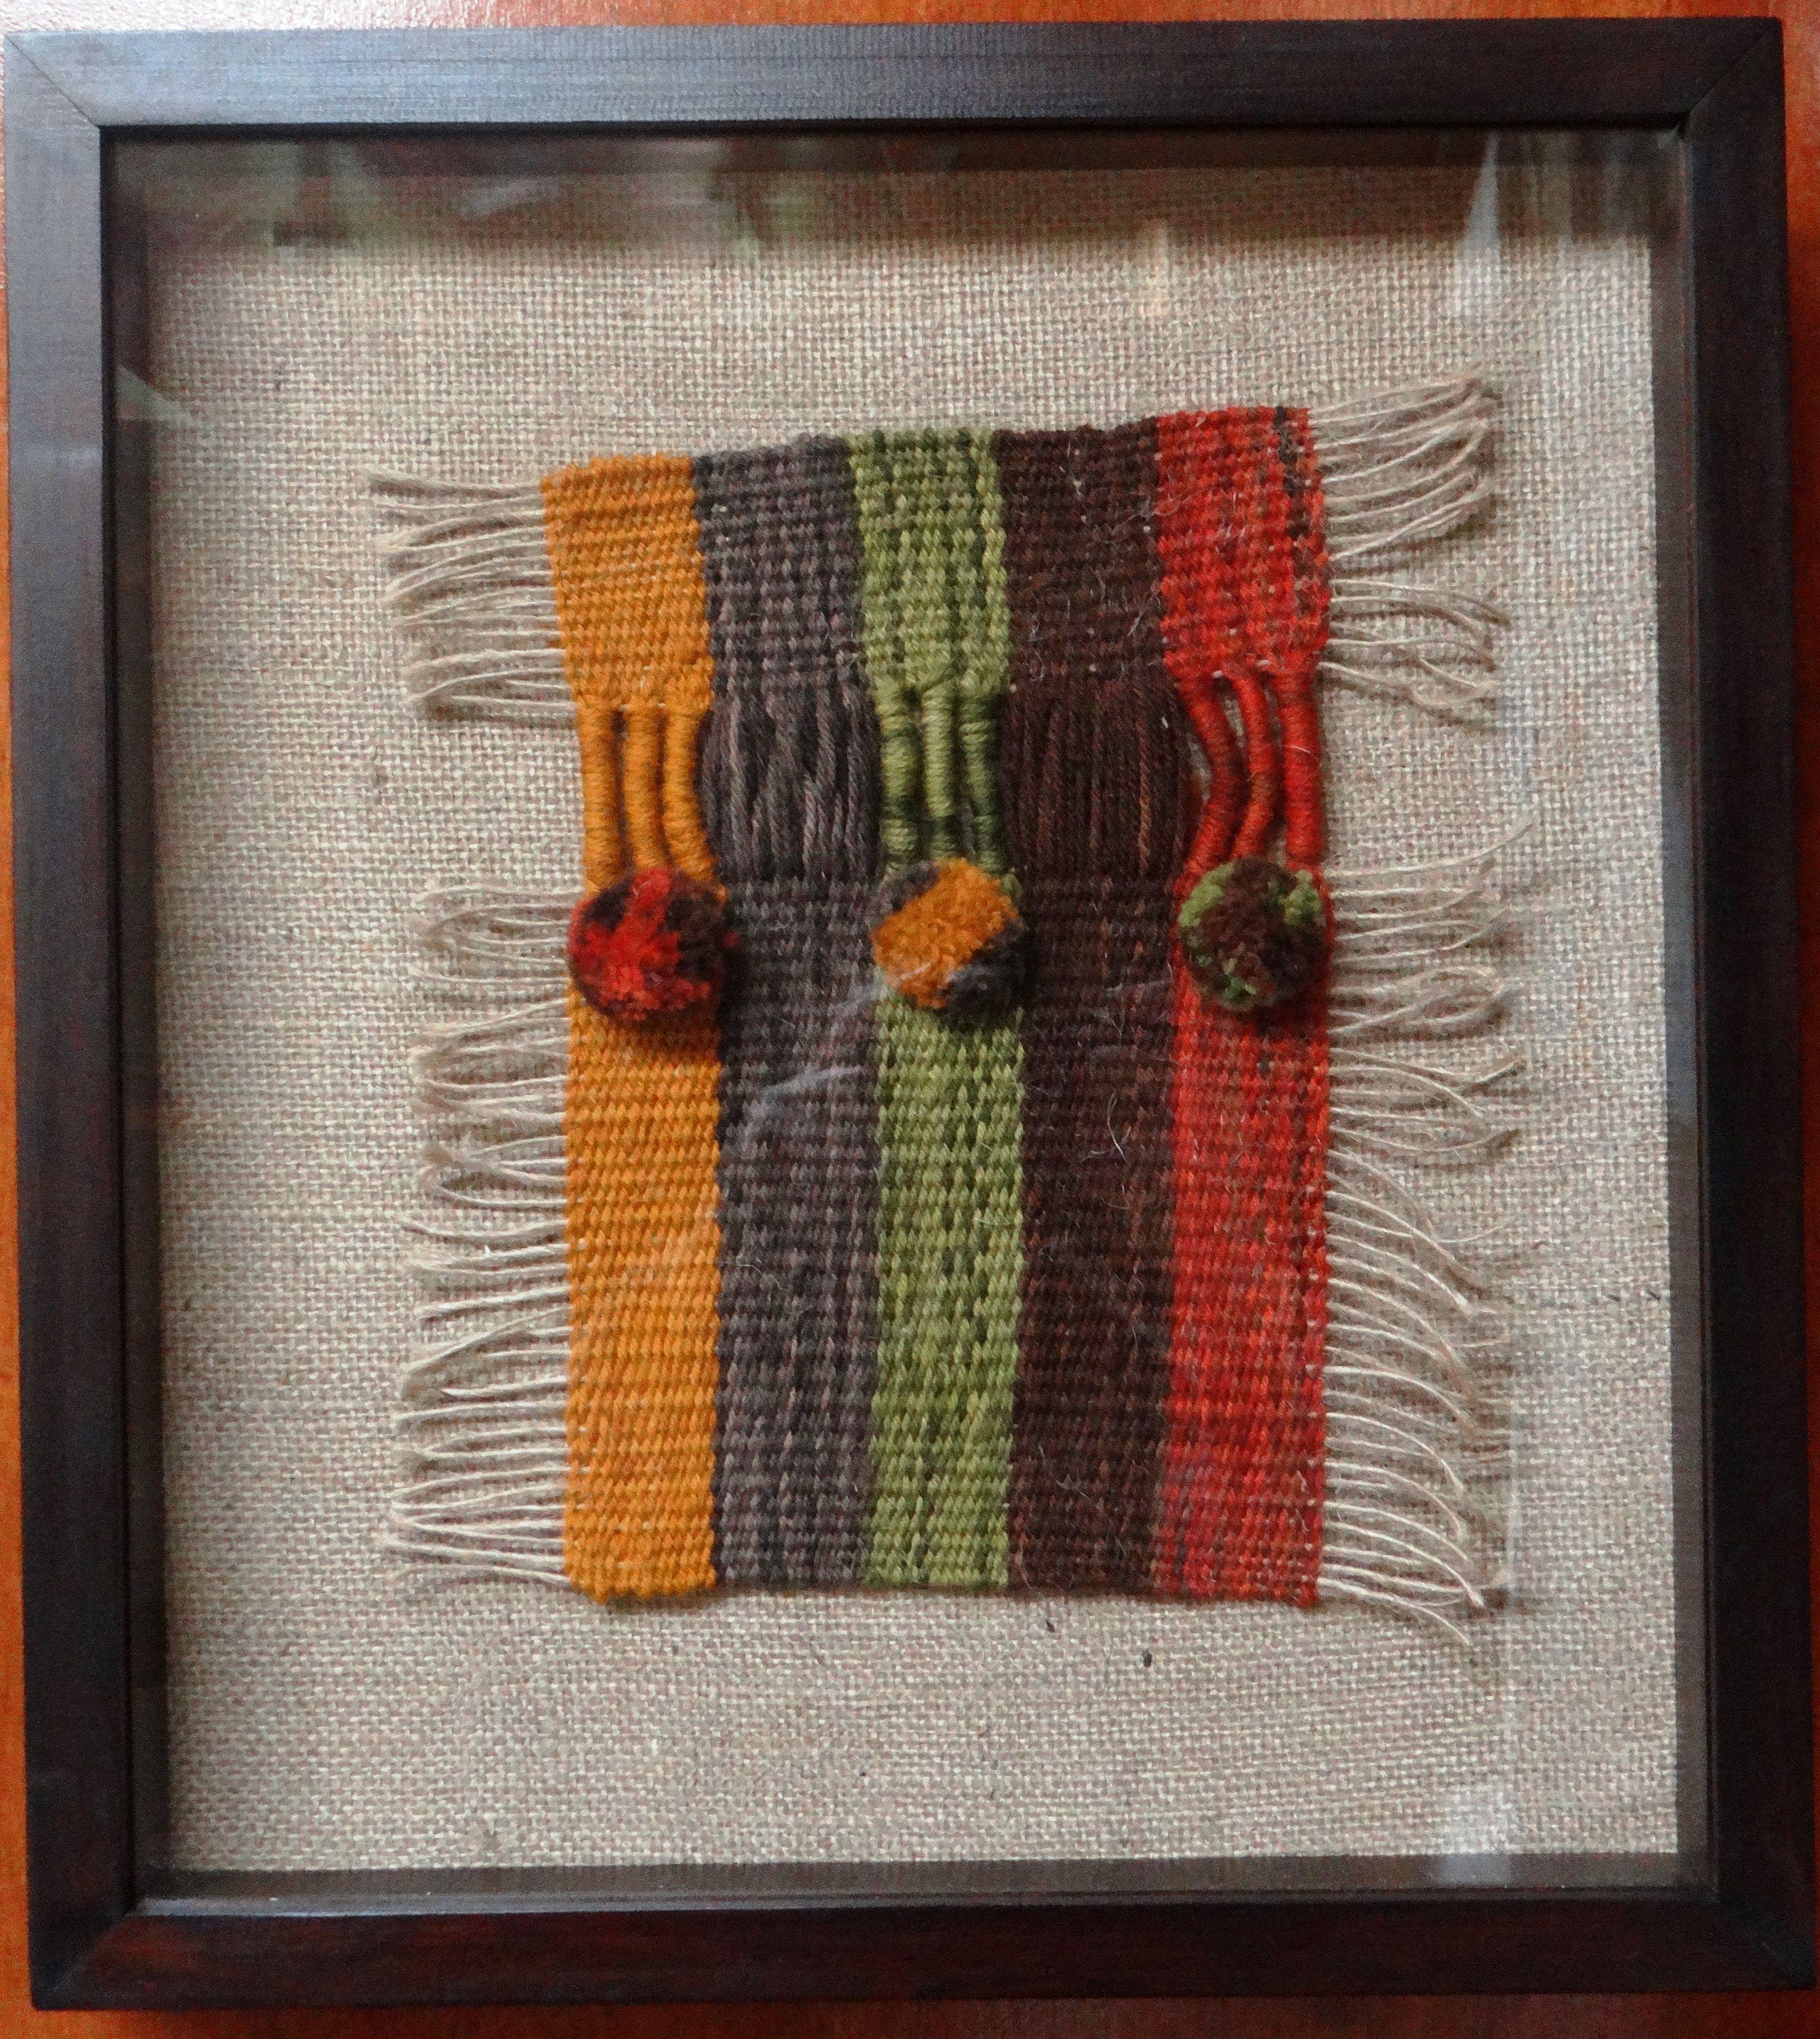 Textil a telar sobre arpillera, marco madera con cubierta de vidro ...